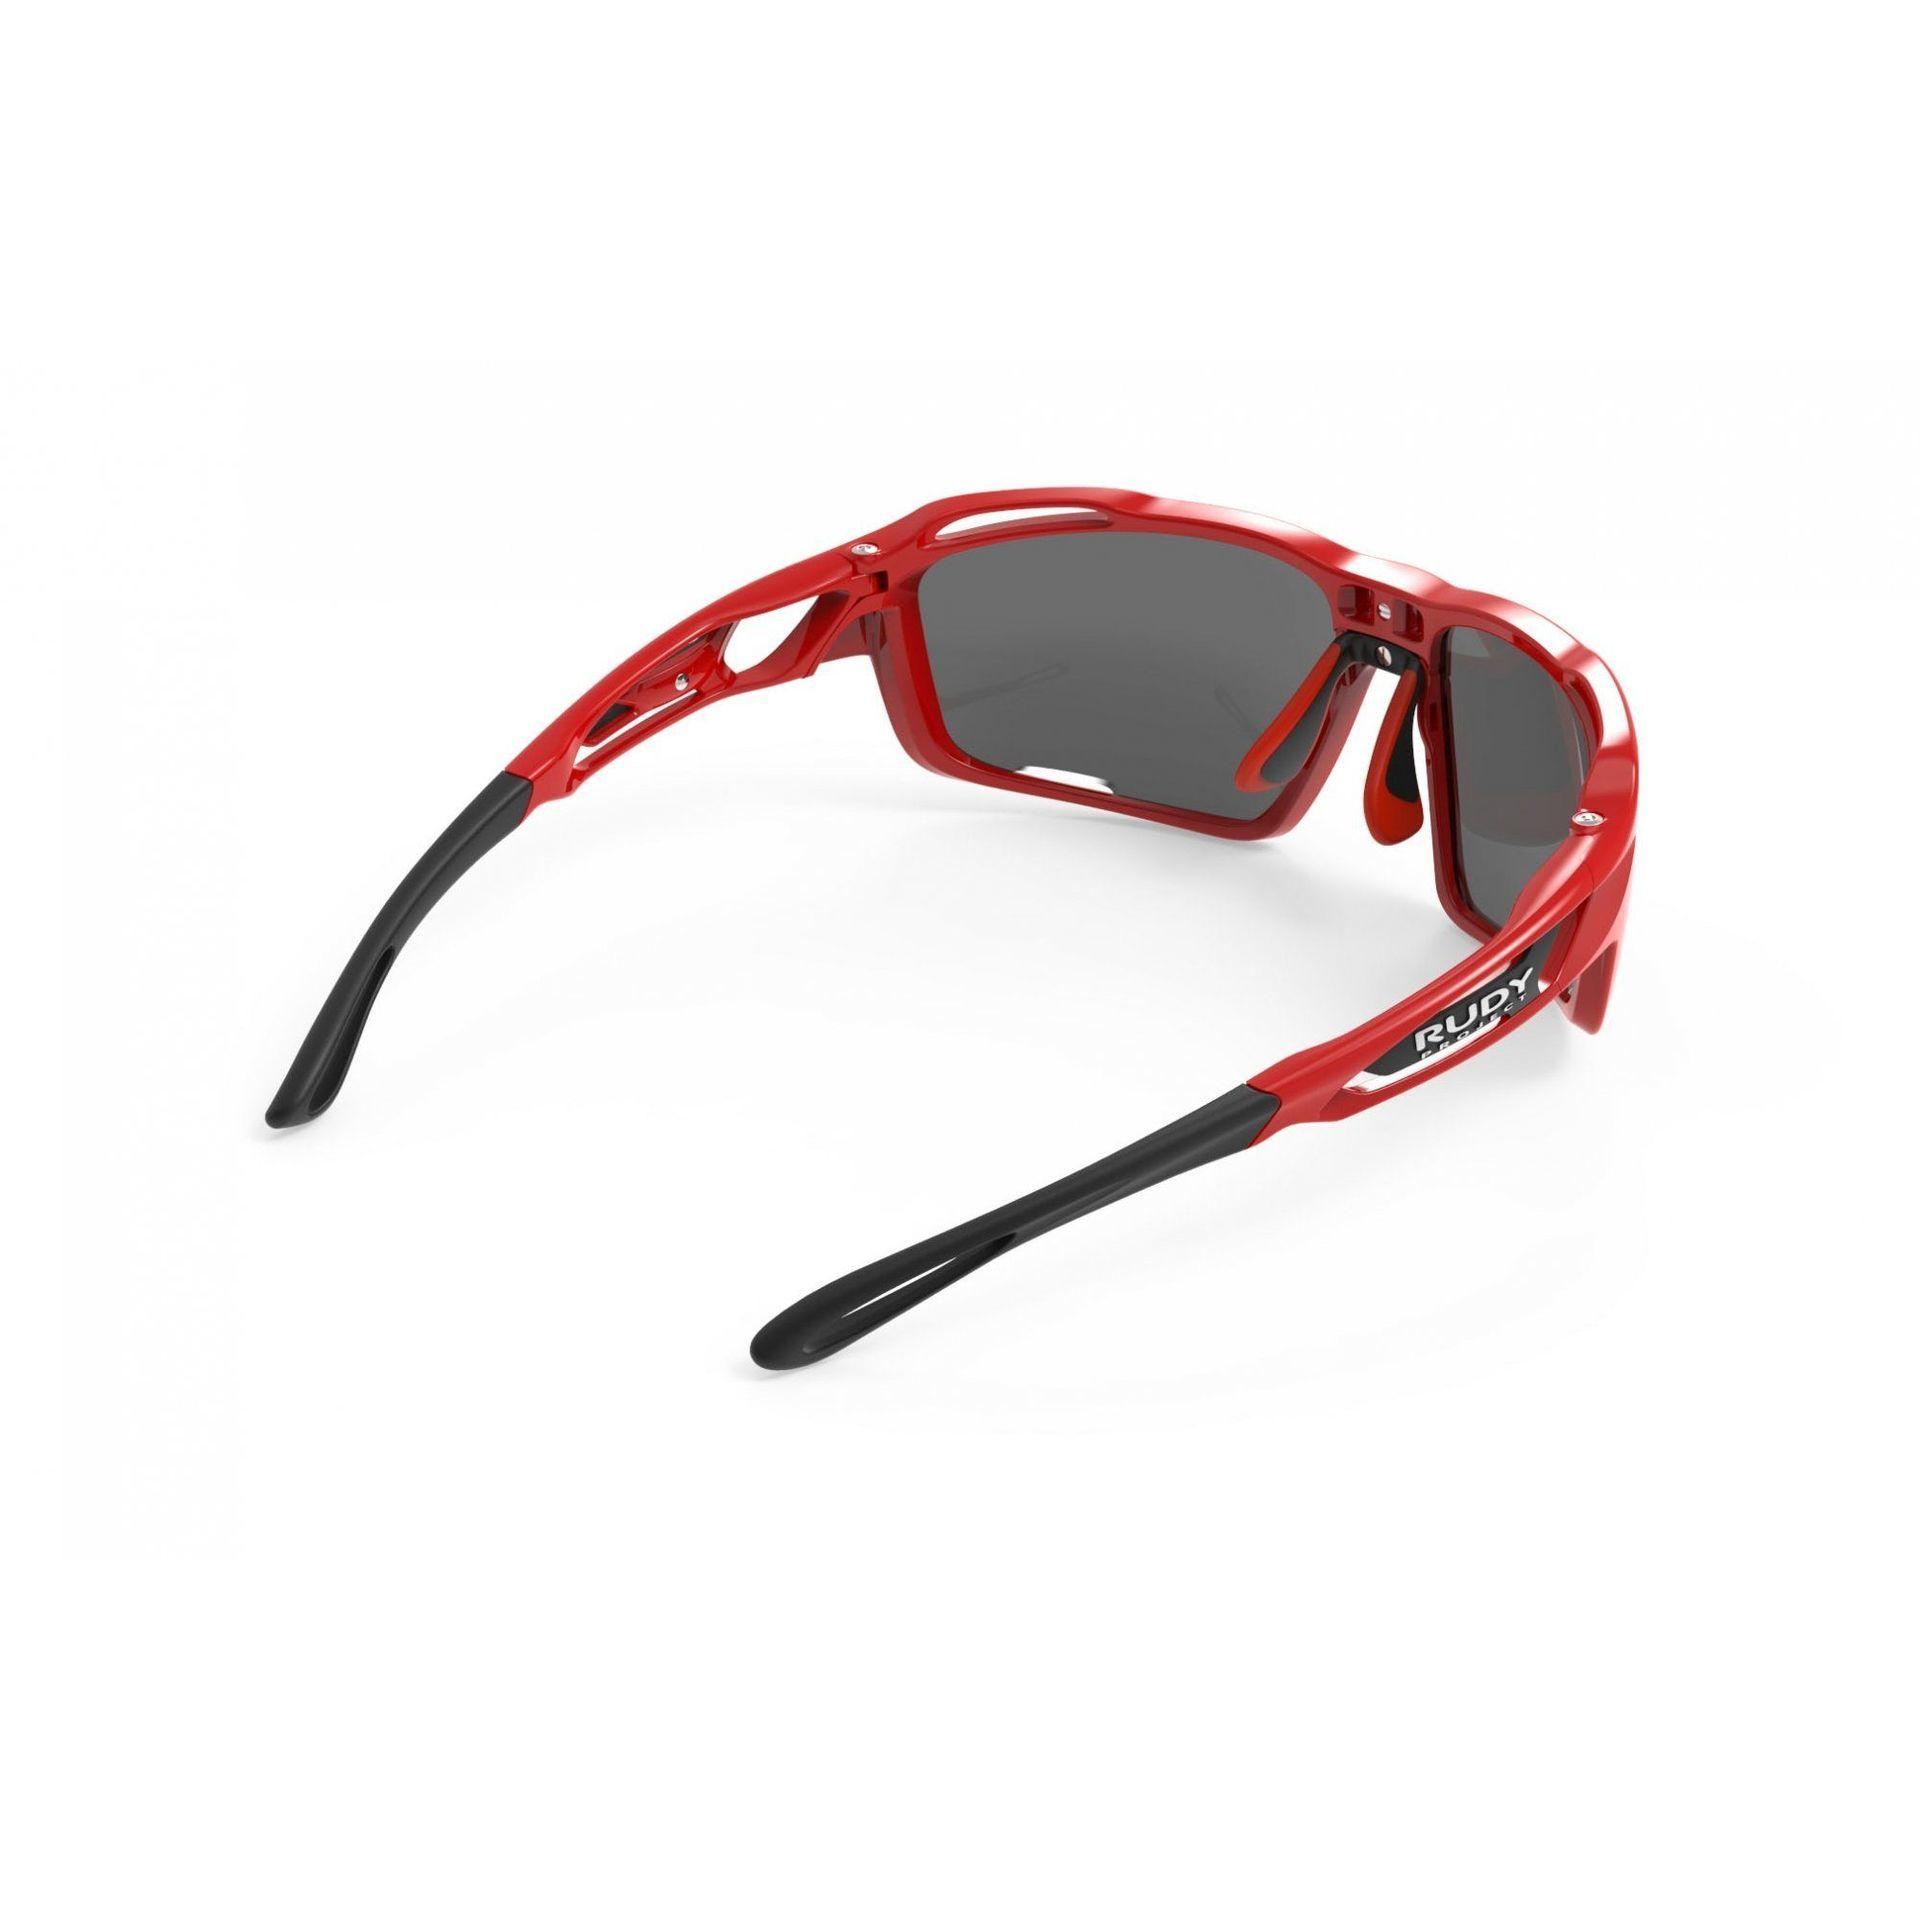 OKULARY RUDY PROJECT SINTRYX FIRE RED + SMOKE|TRANS SP491045 5